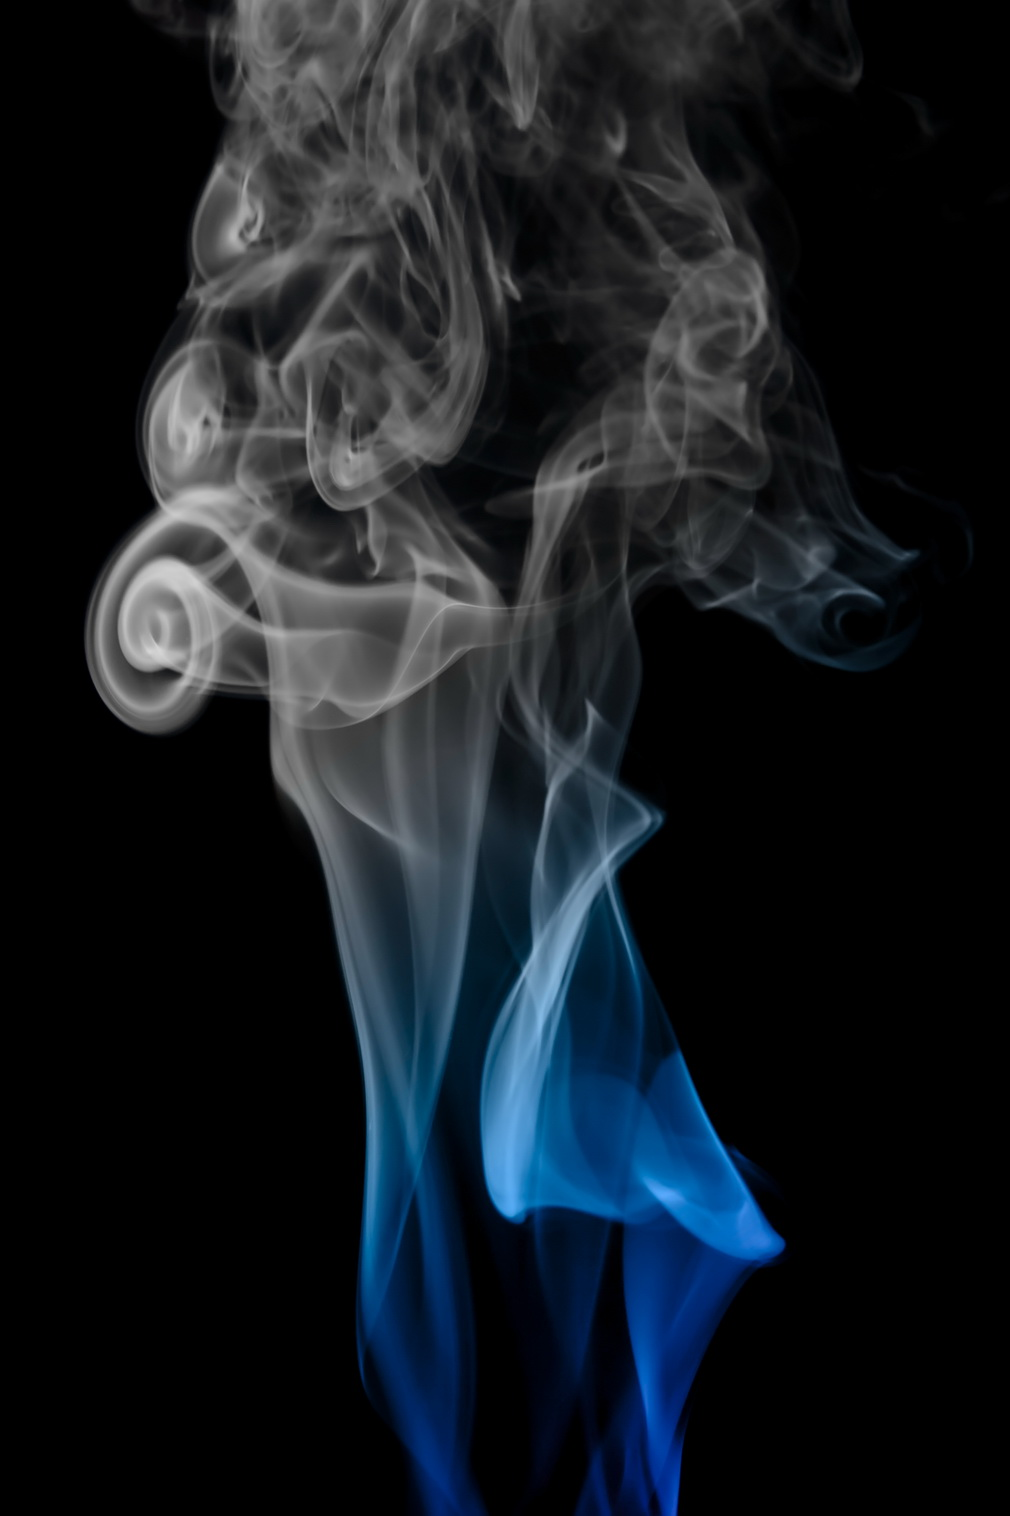 Gray and blue smoke photo